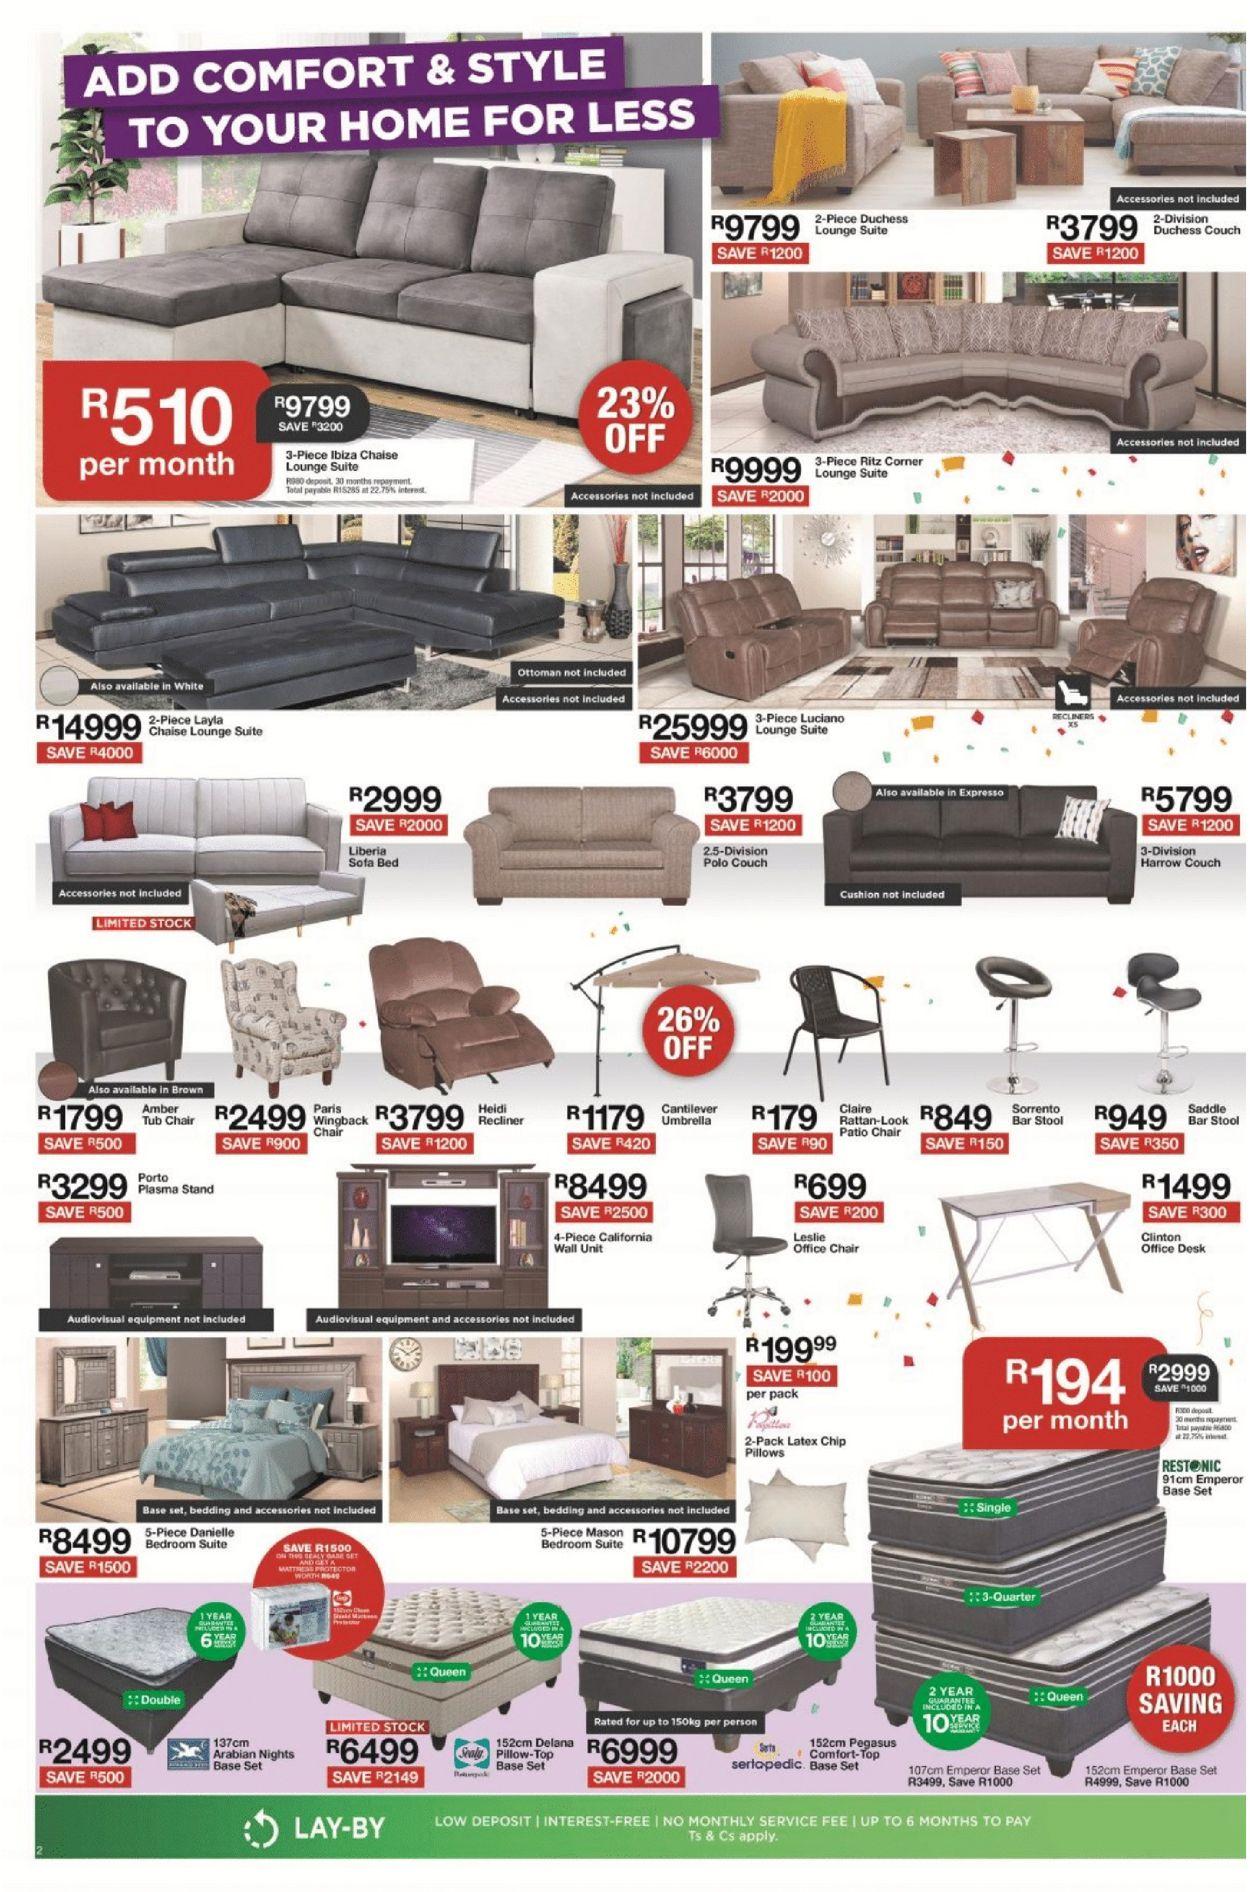 House & Home Catalogue - 2019/05/21-2019/06/02 (Page 2)